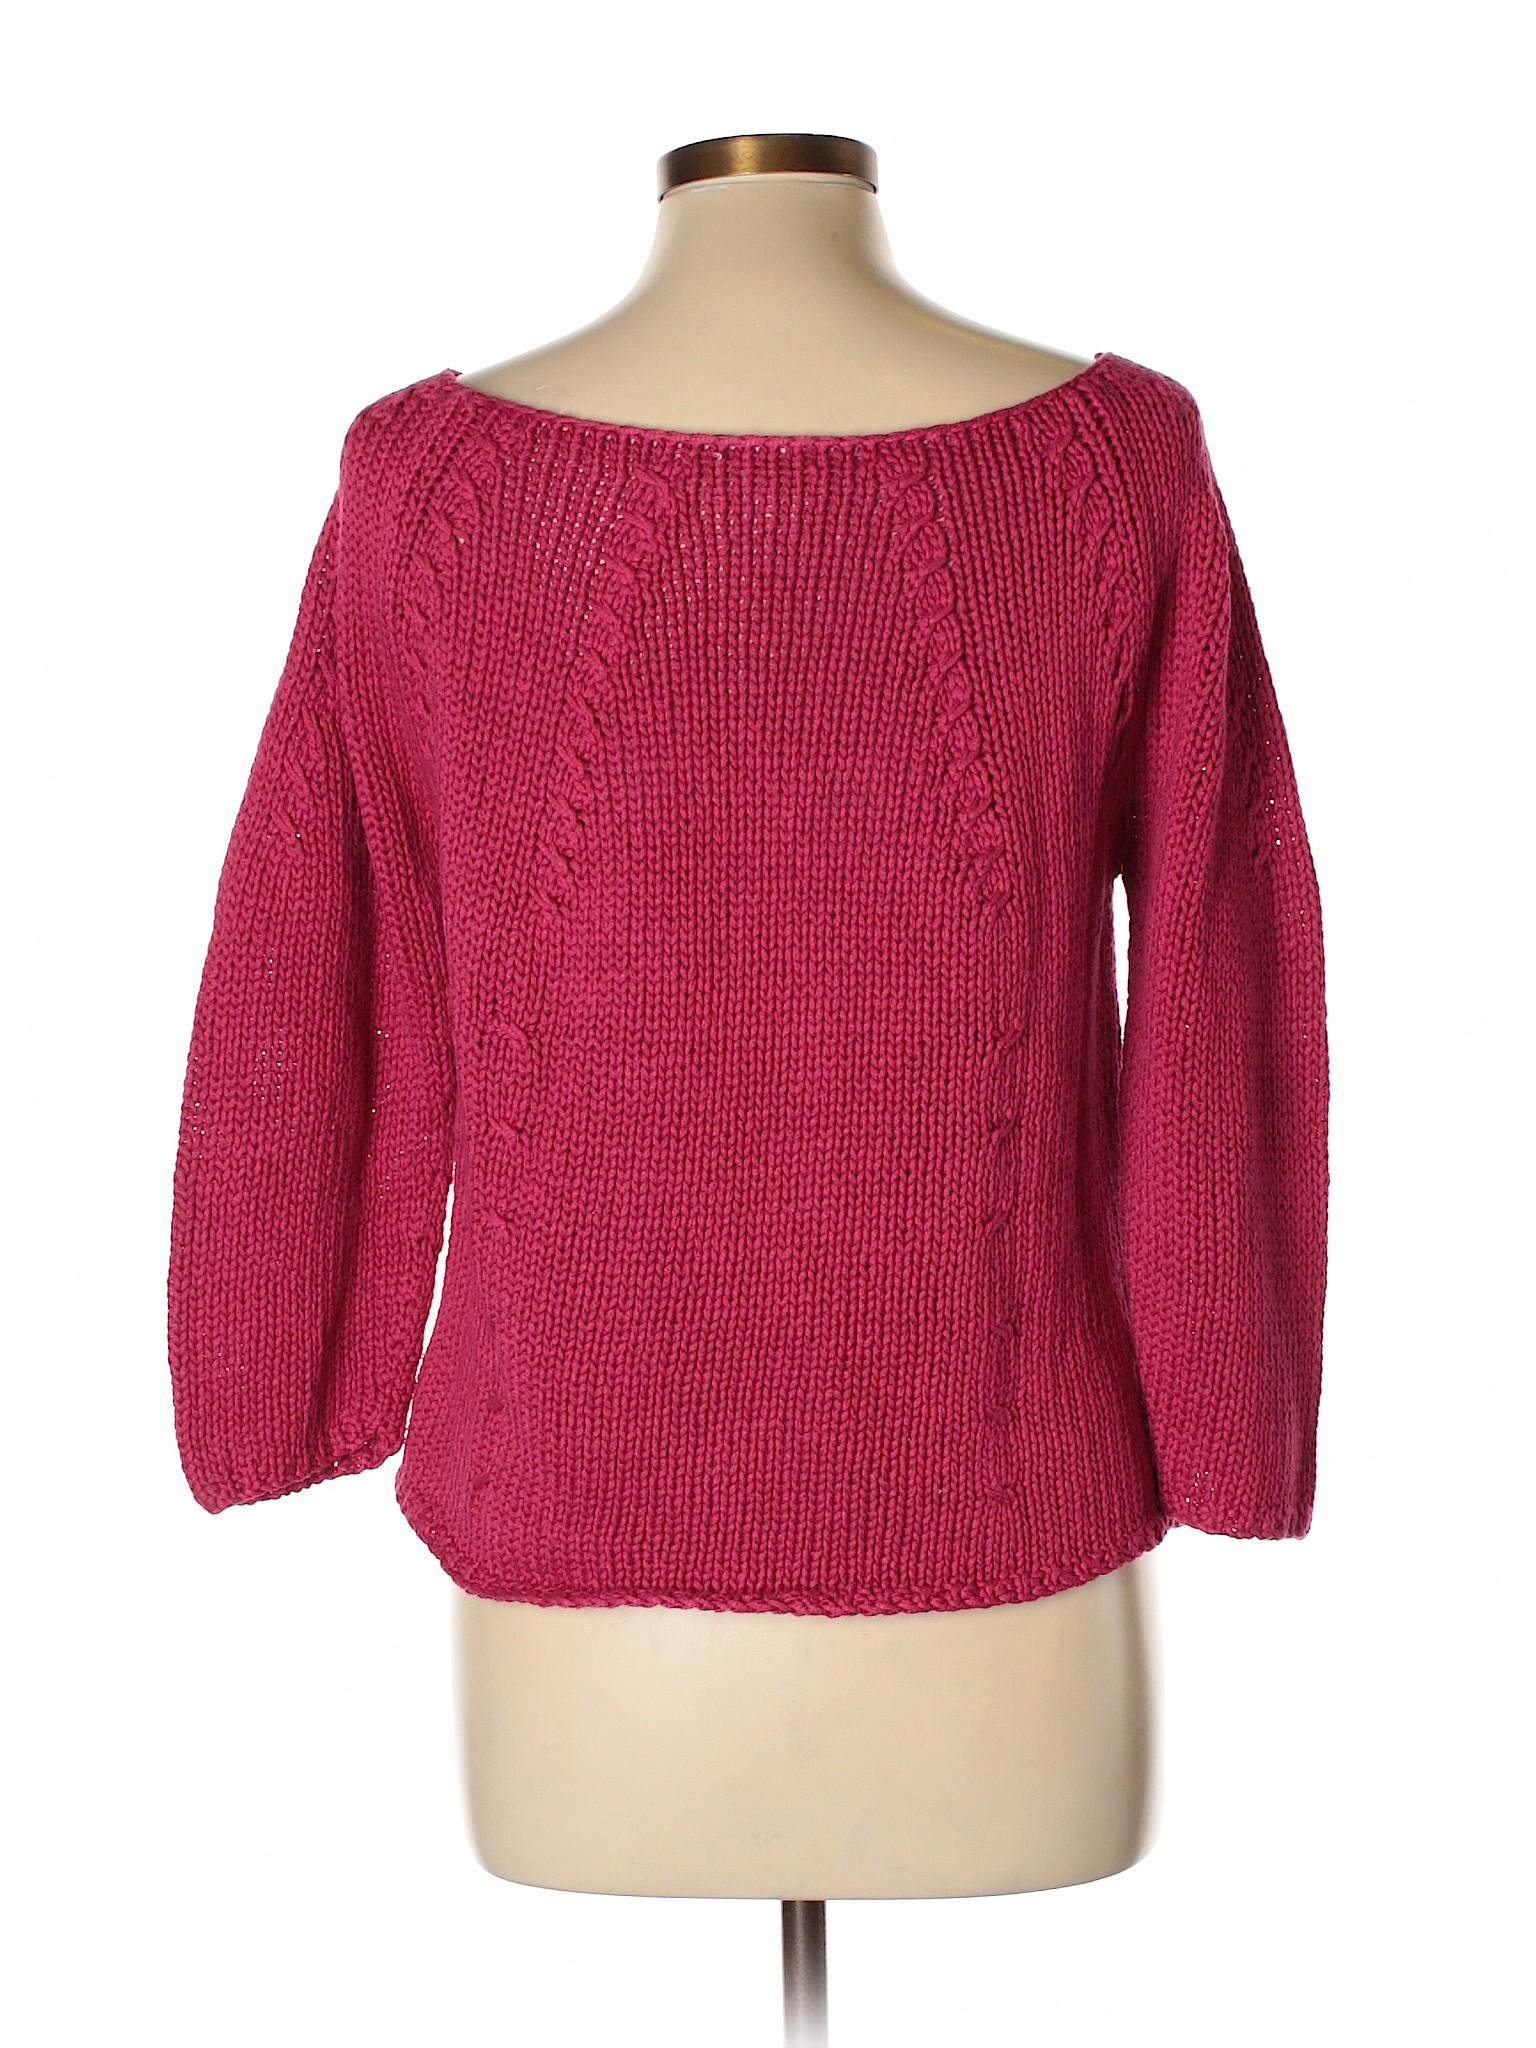 Boutique Garnet Pullover Boutique Hill Garnet Sweater gxvP7wTq